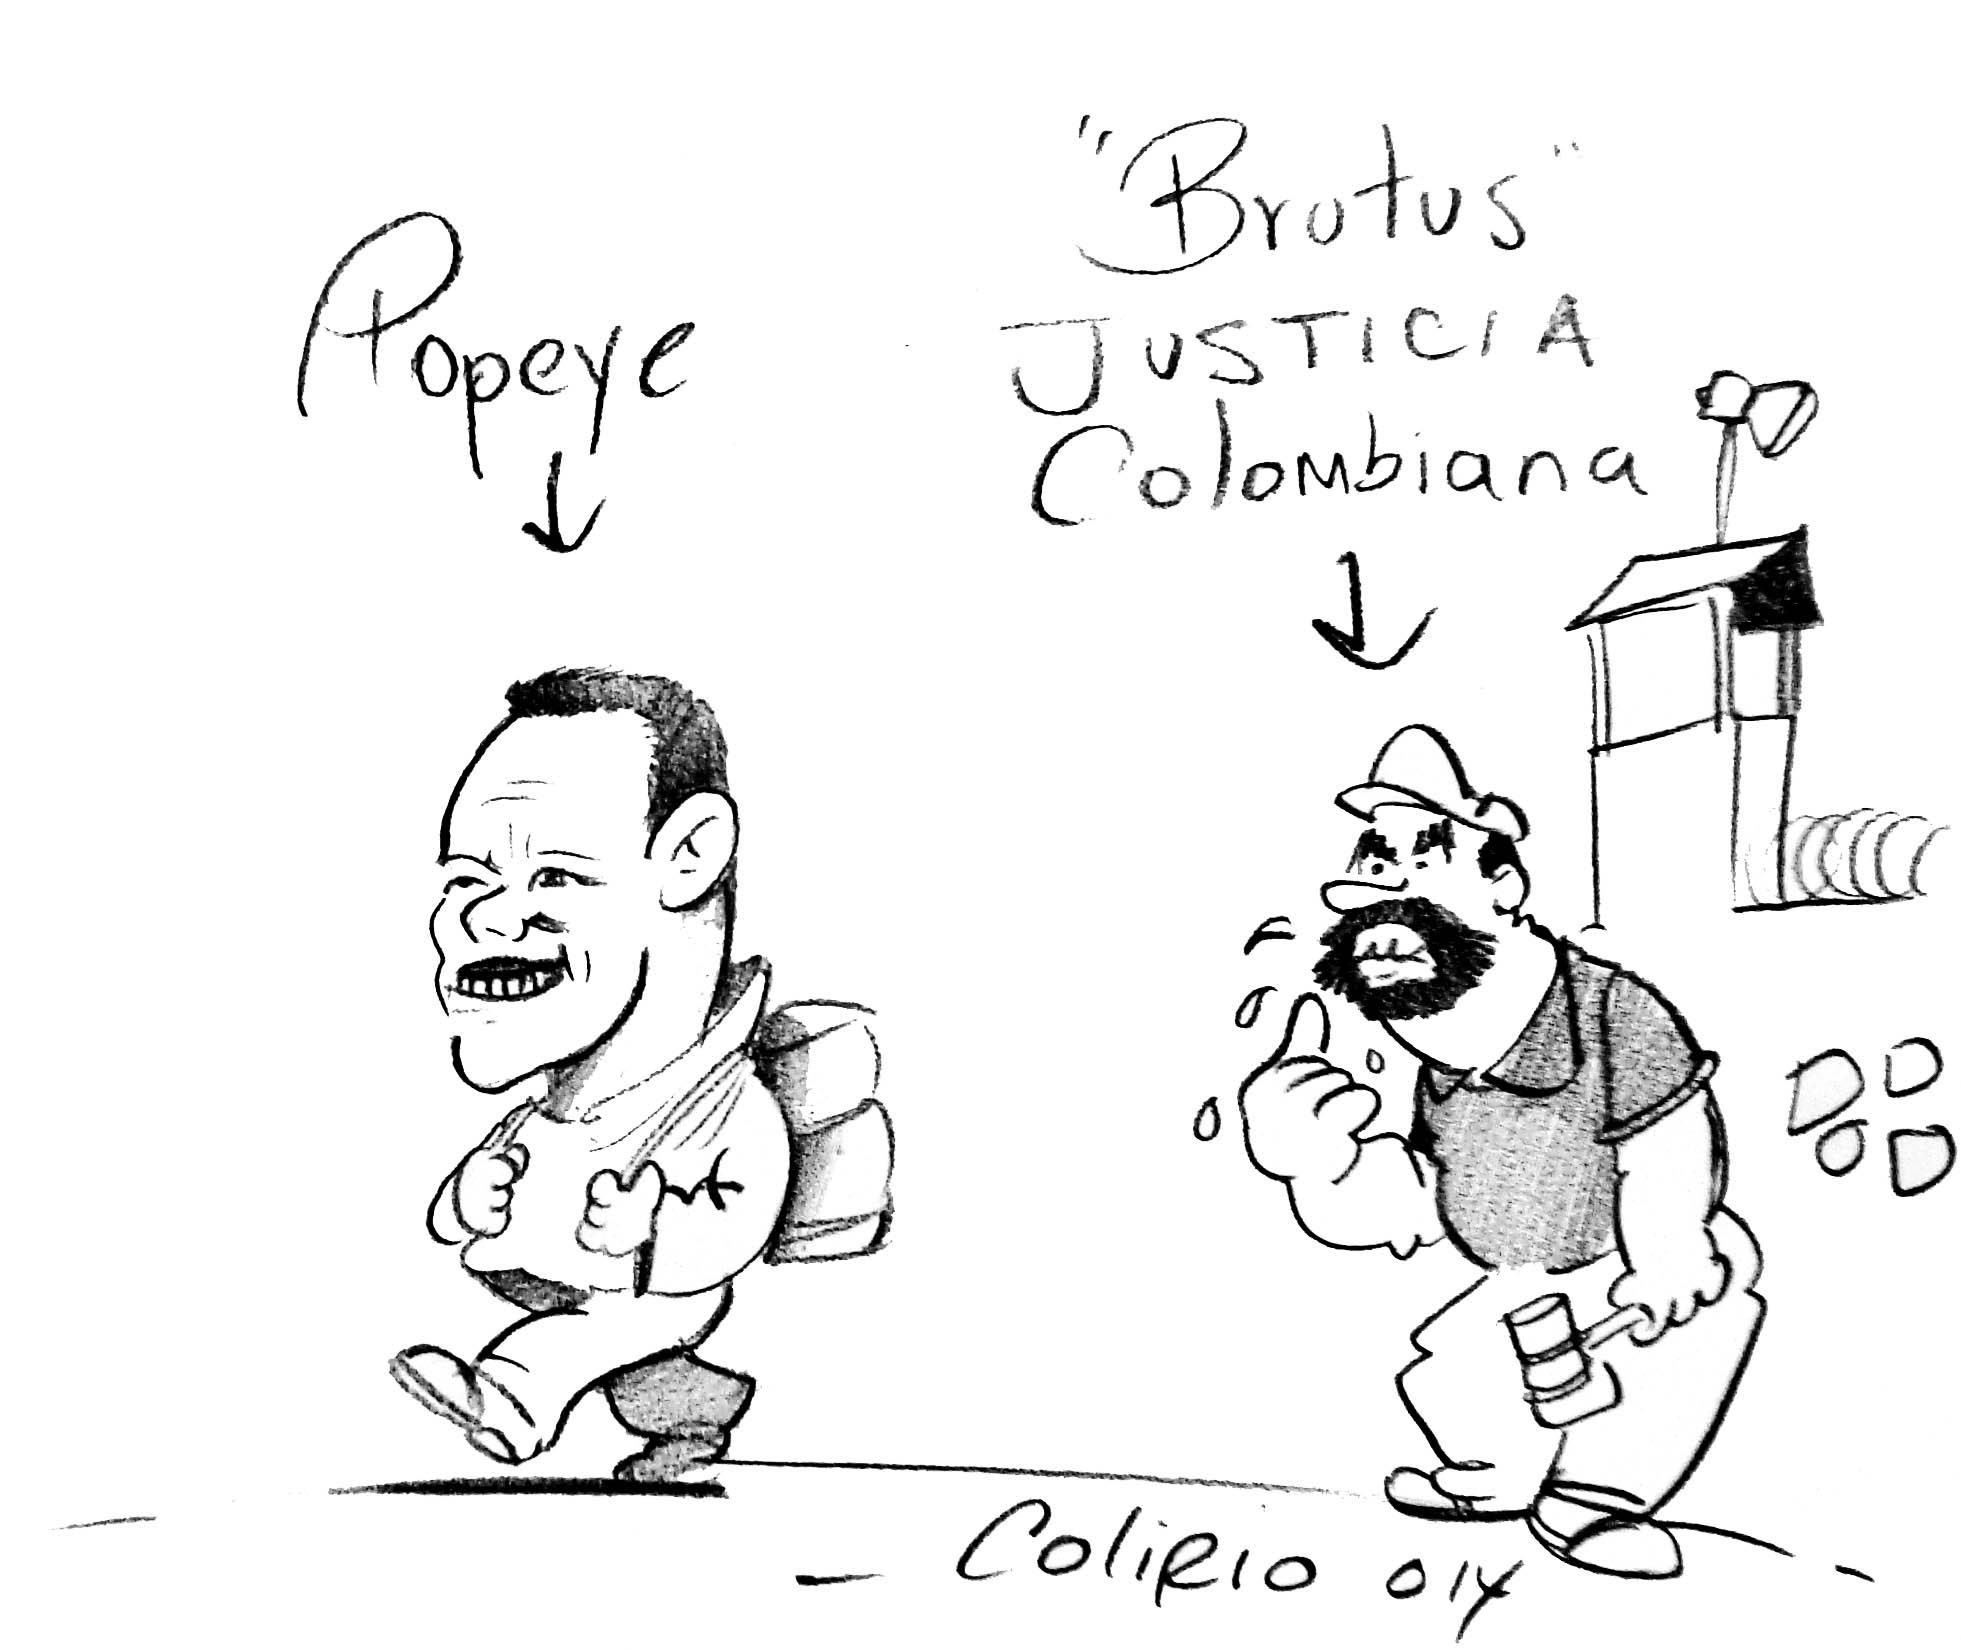 carica sabado 30 de agosto de 2014